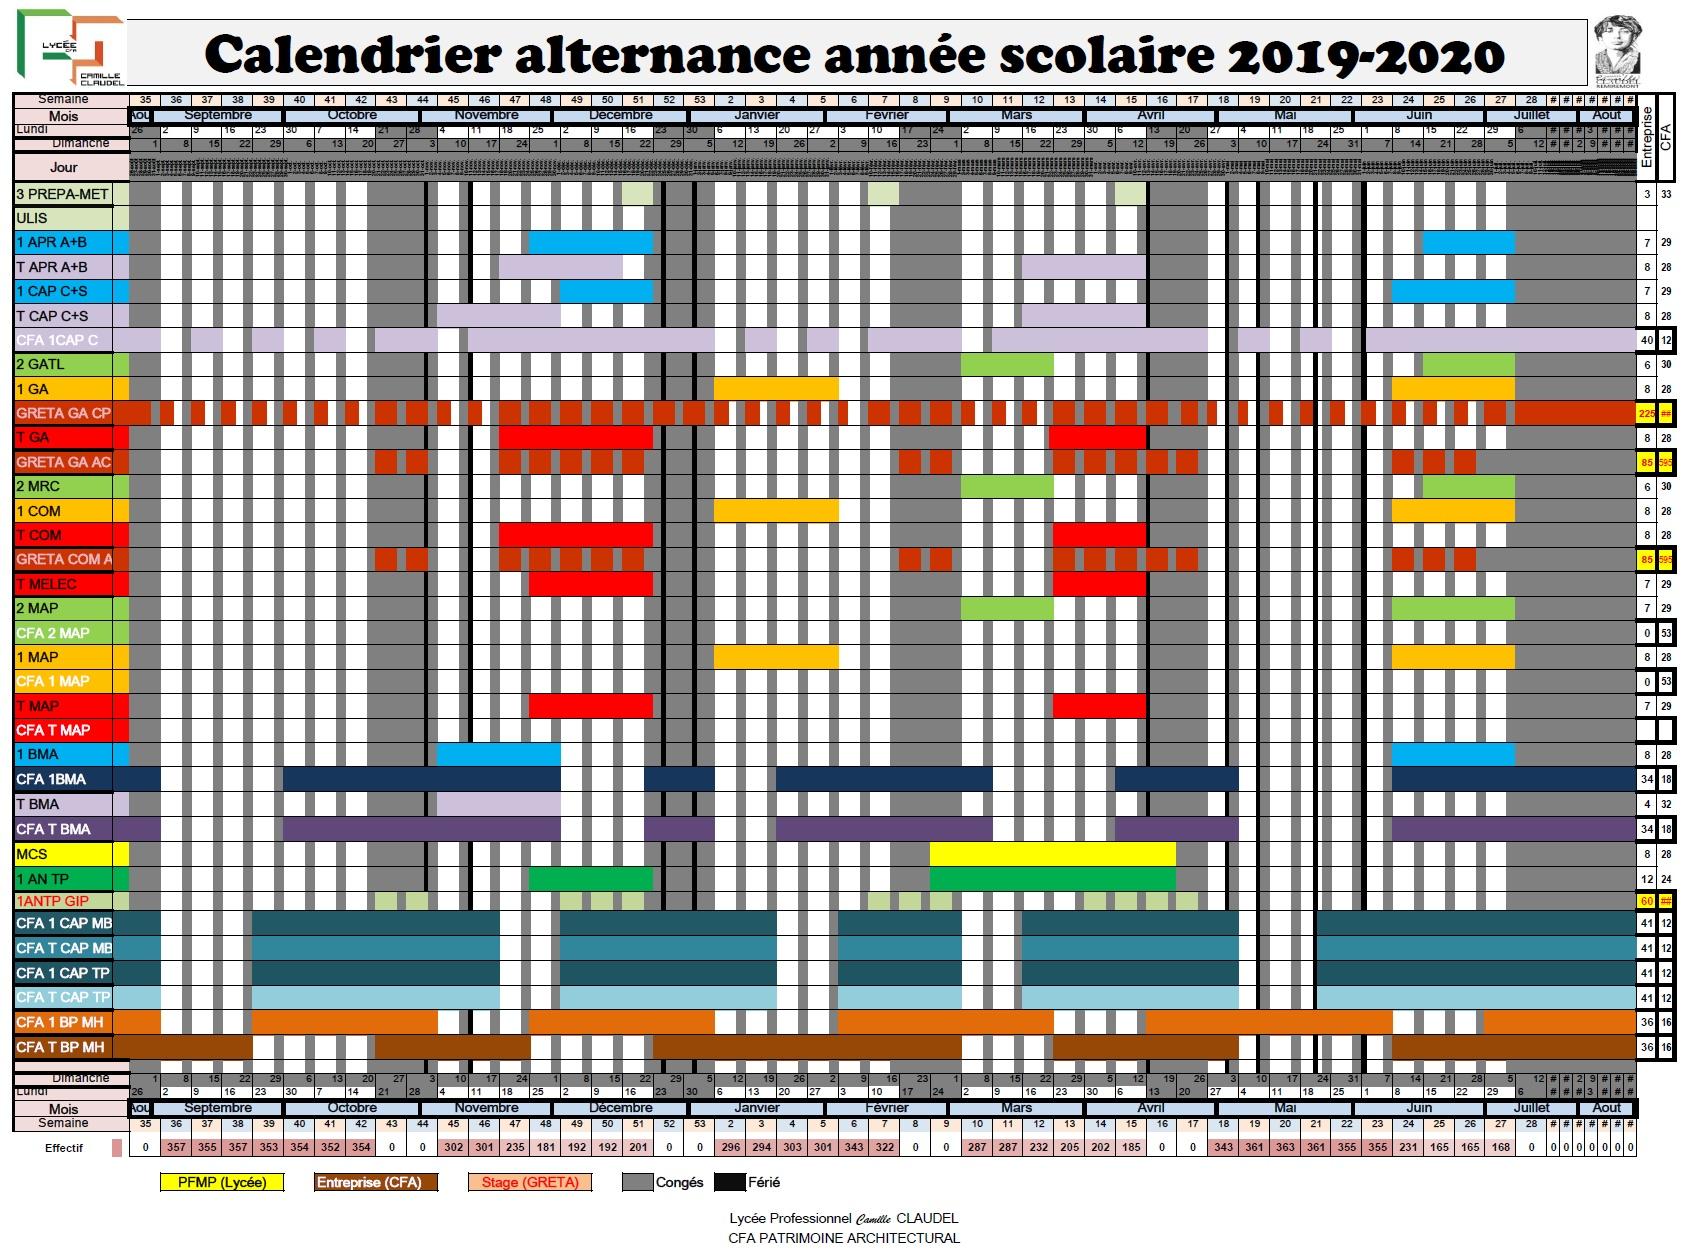 Calendrier alternance année scolaire 2019-2020